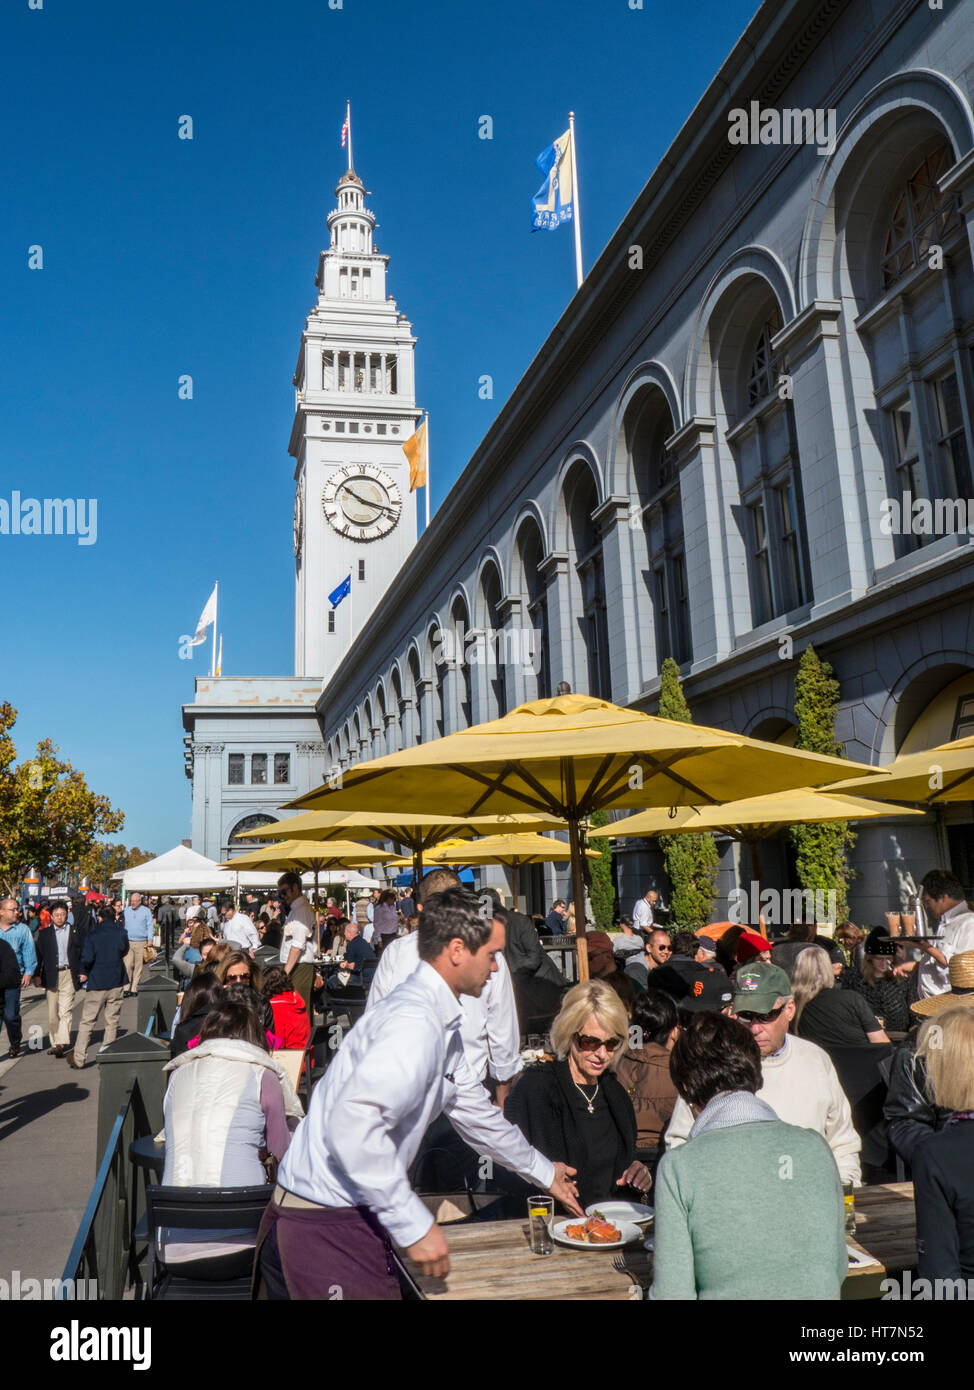 Alfresco restaurant dining on Embarcadero Ferry Building Farmers Market day San Francisco California USA - Stock Image